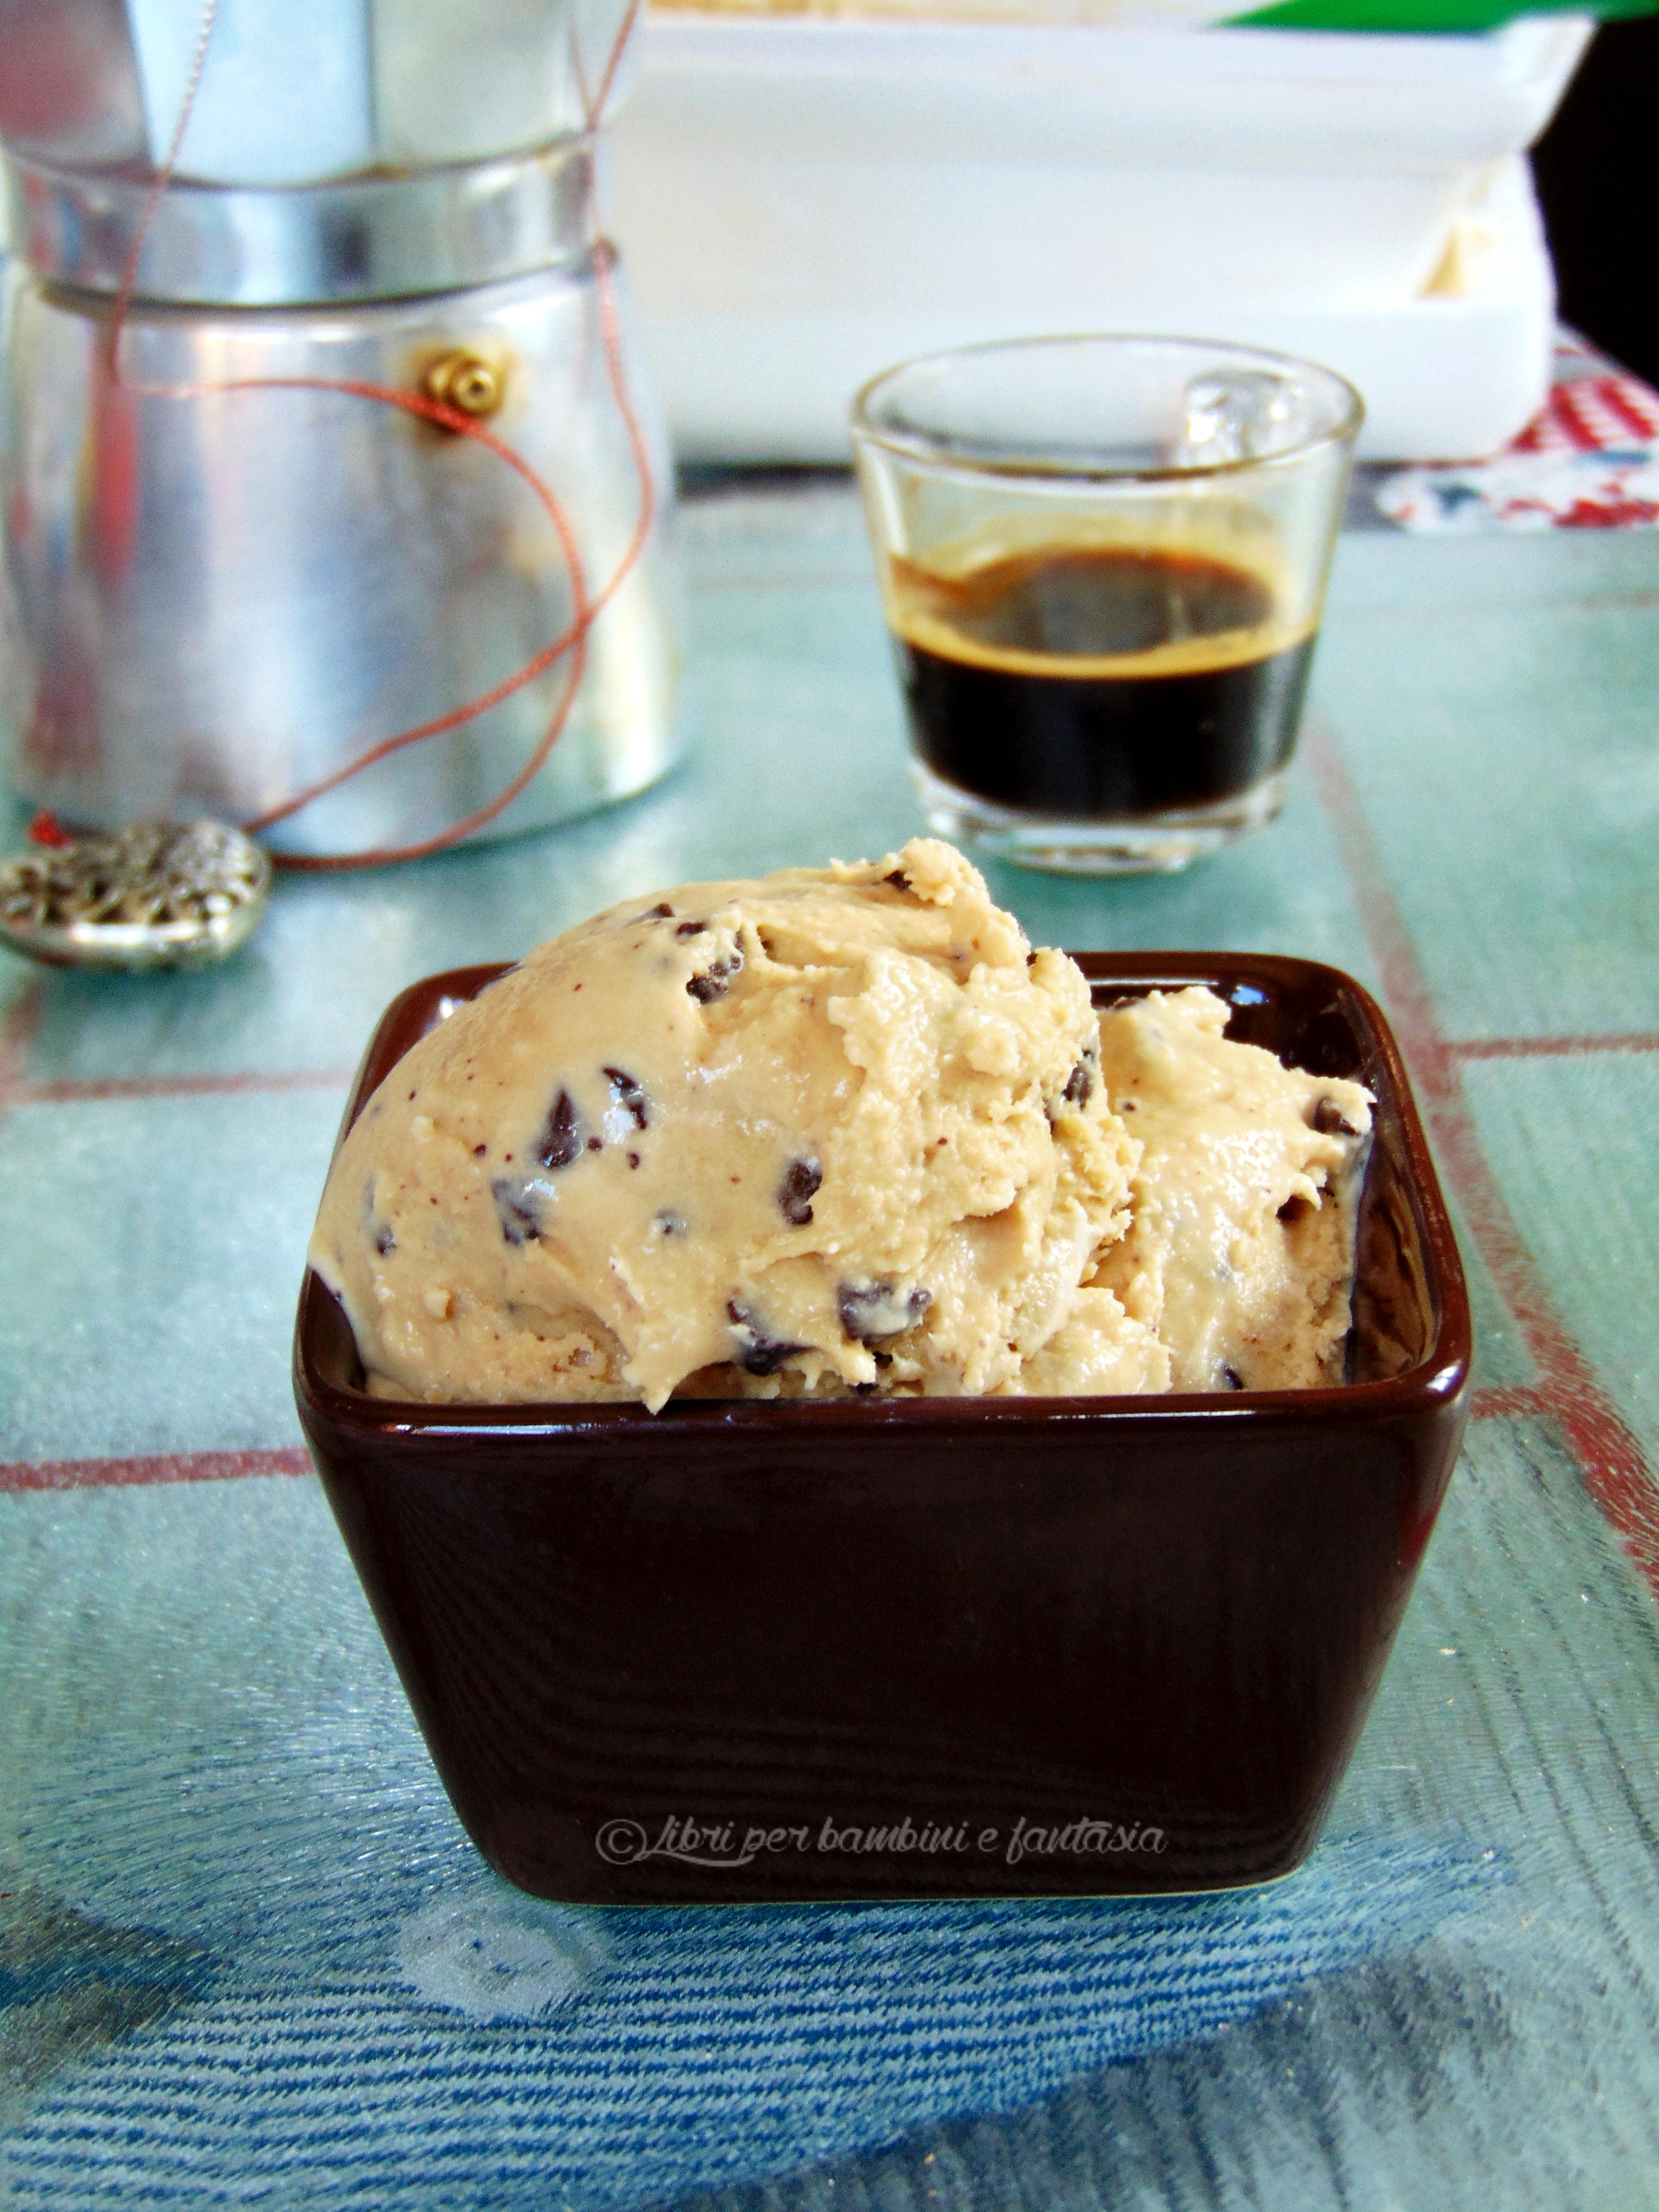 gelato al caffè 2